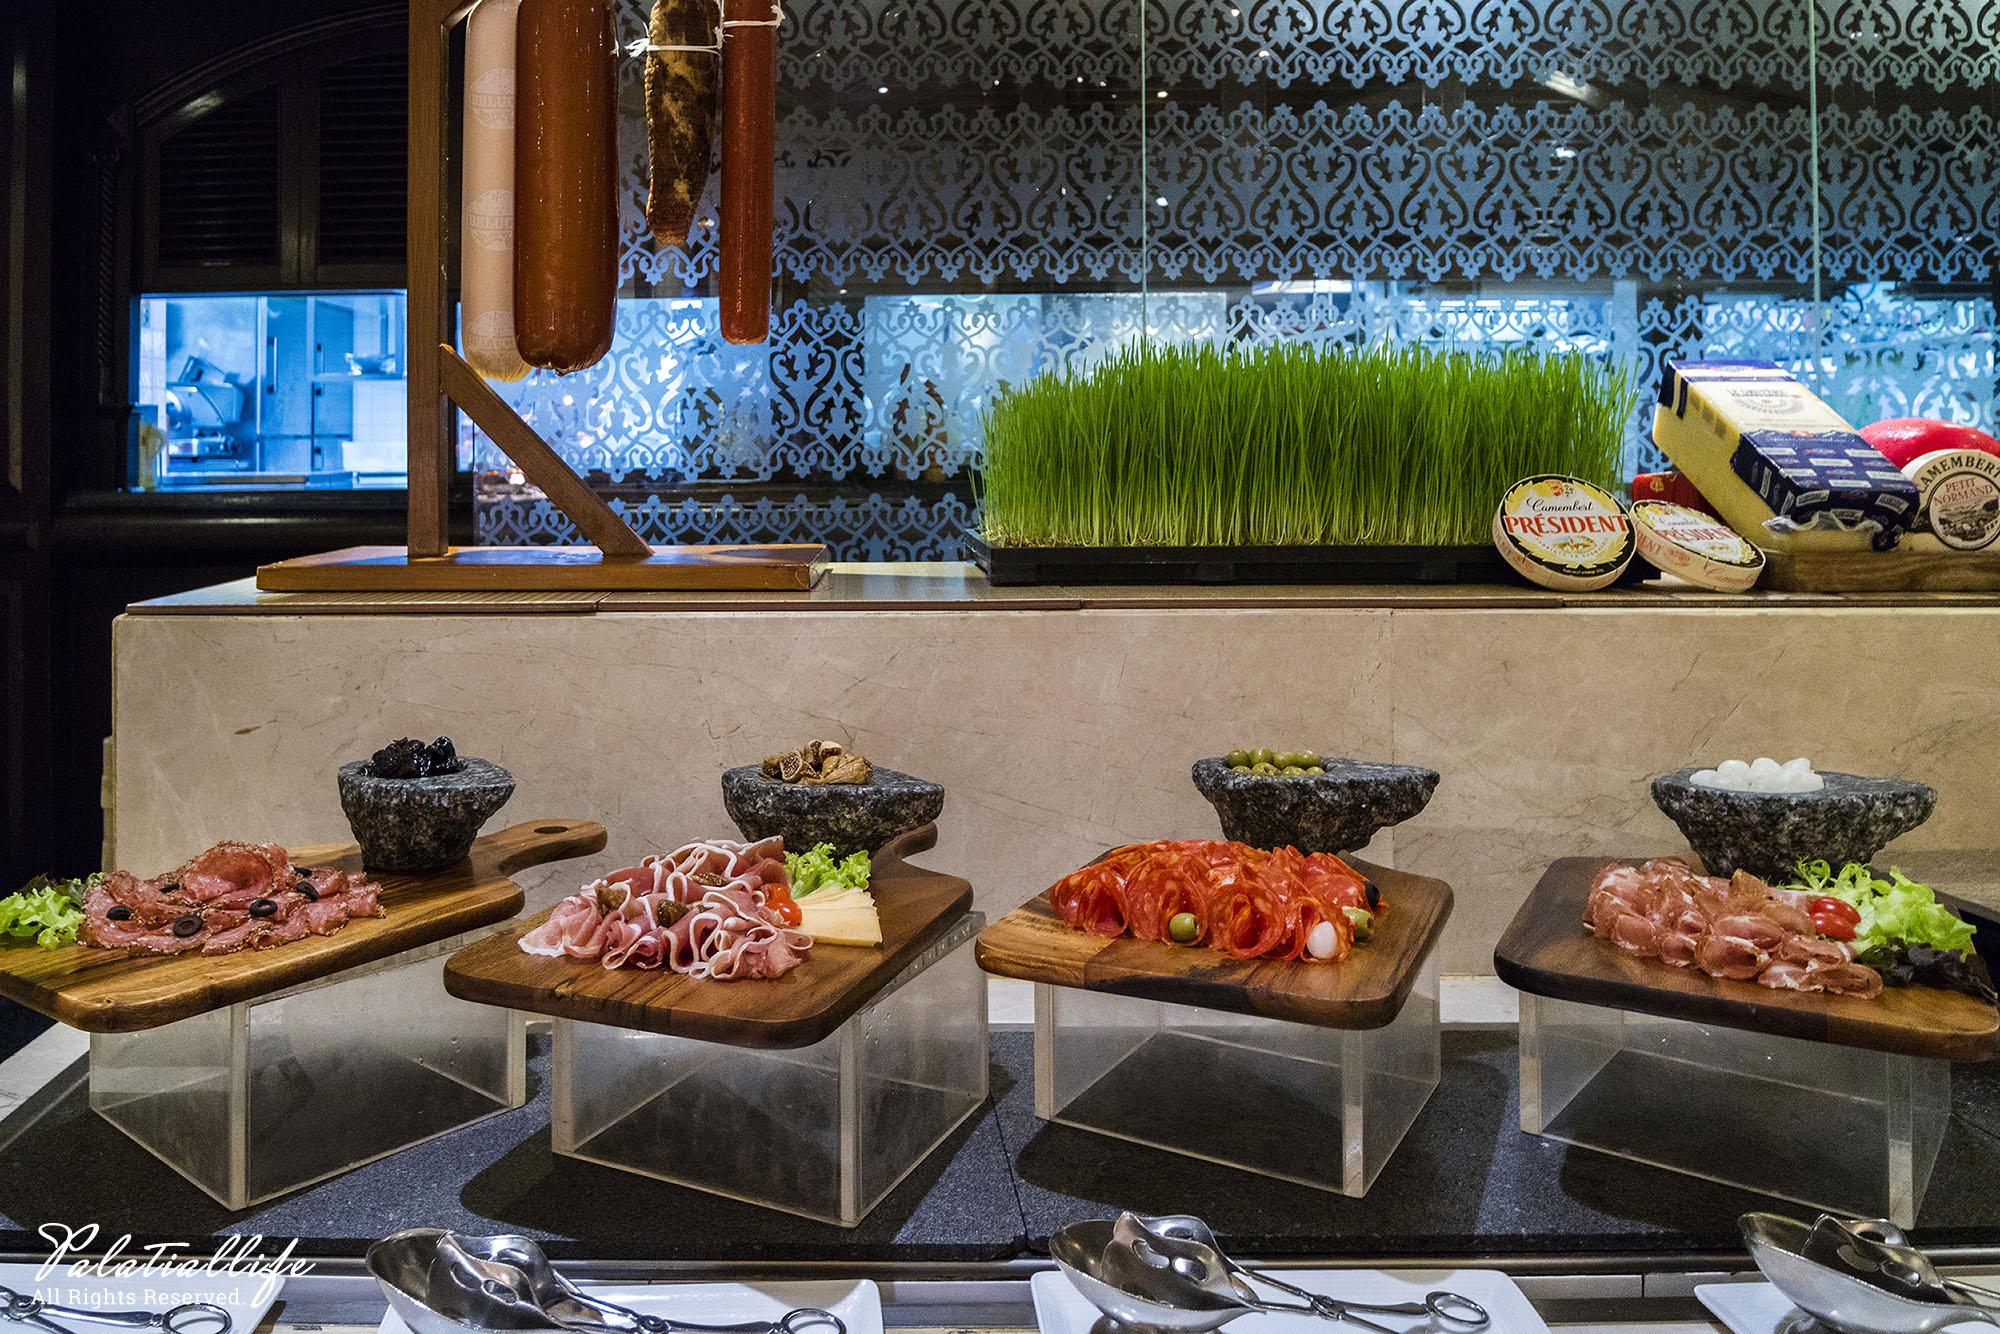 The Pavilion ชั้น Lobby โรงแรม Dusit Thani Bangkok  ห้องอาหาร The Pavilion โรงแรมดุสิตธานี กรุงเทพ ฯ บุฟเฟ่ต์ซีฟู้ดส์ ค่ำวันศุกร์-เสาร์ สุดอลัง IMG 0067